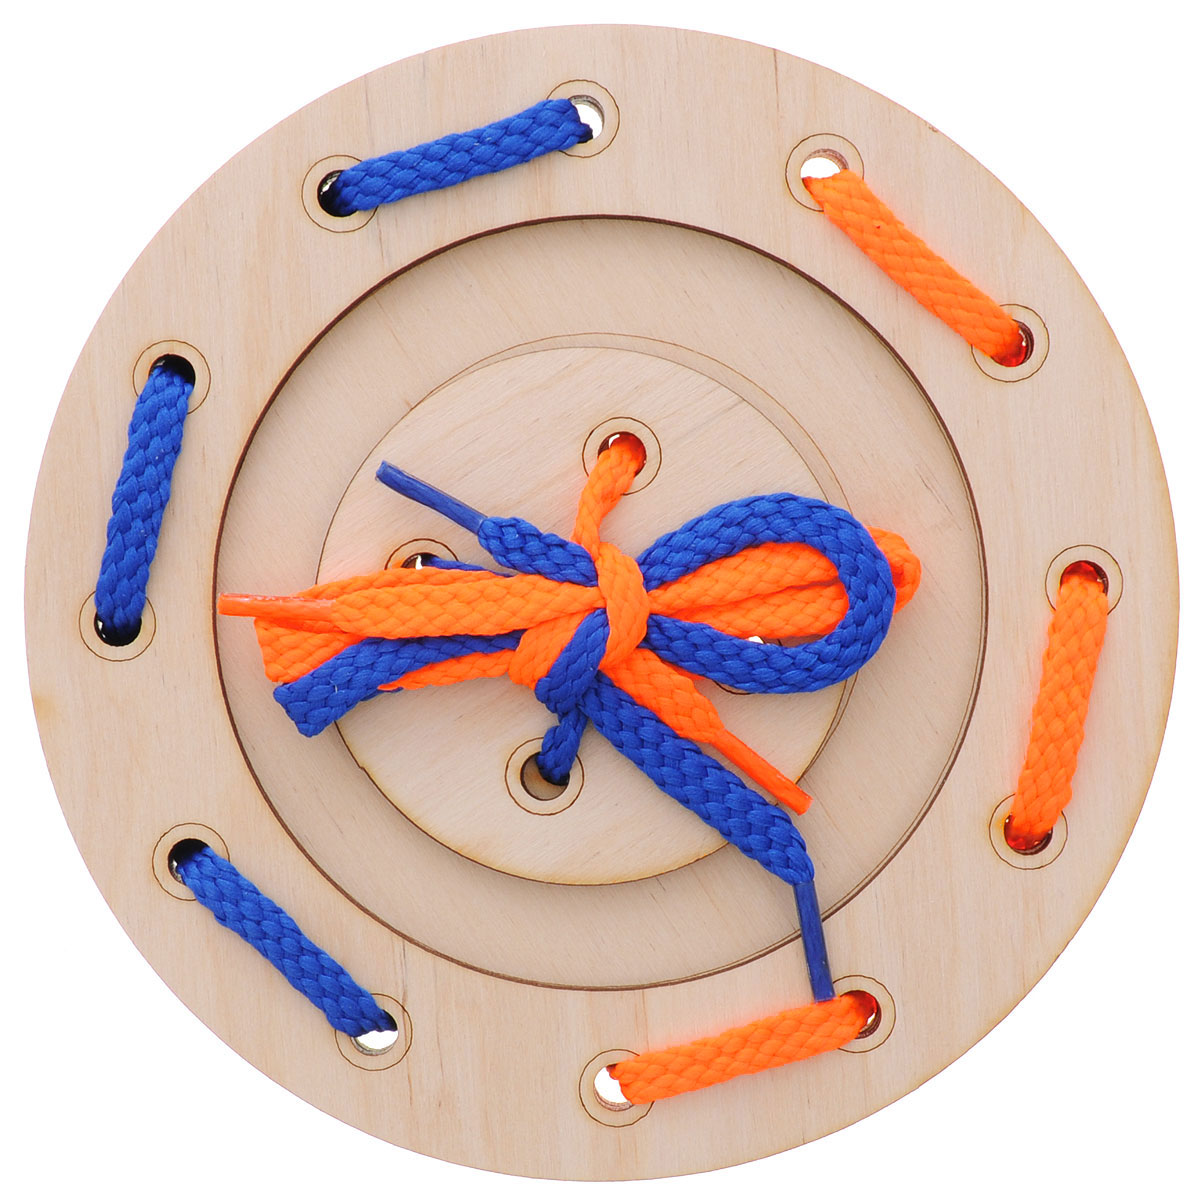 Мастер Вуд Игра-шнуровка Пуговичка цвет синий оранжевый мастер вуд игра шнуровка пуговичка цвет синий желтый